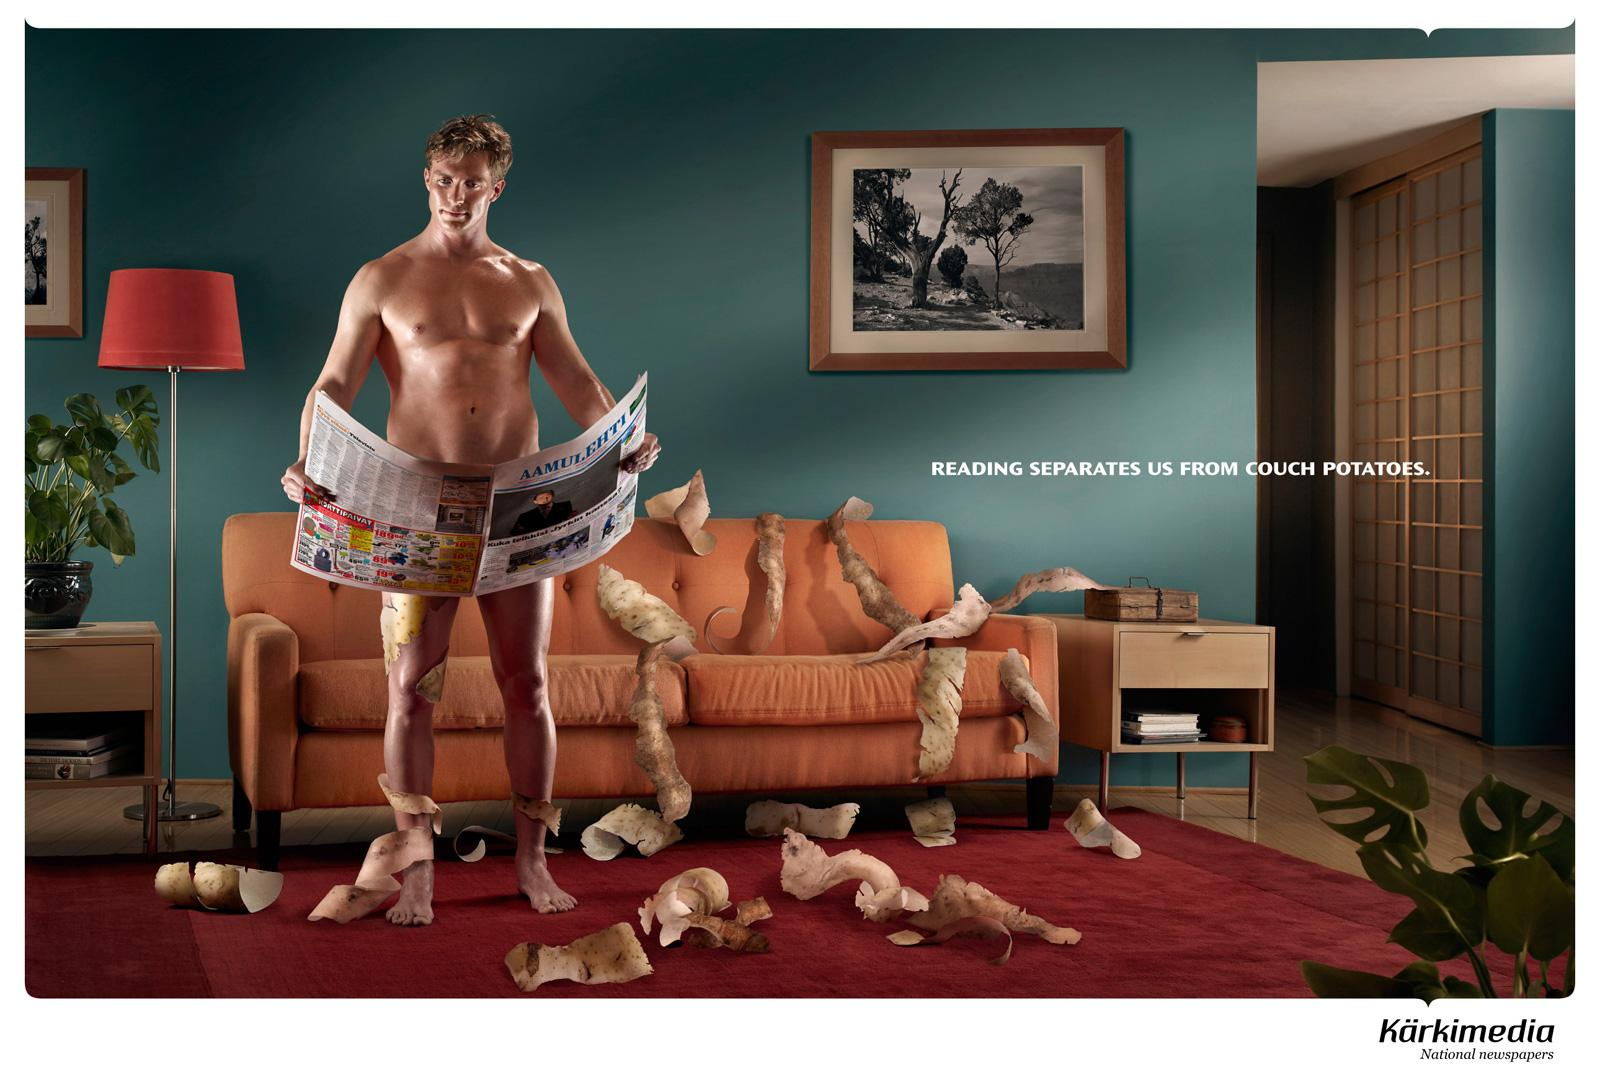 Kärkimedia Print Ad -  Former couch potato